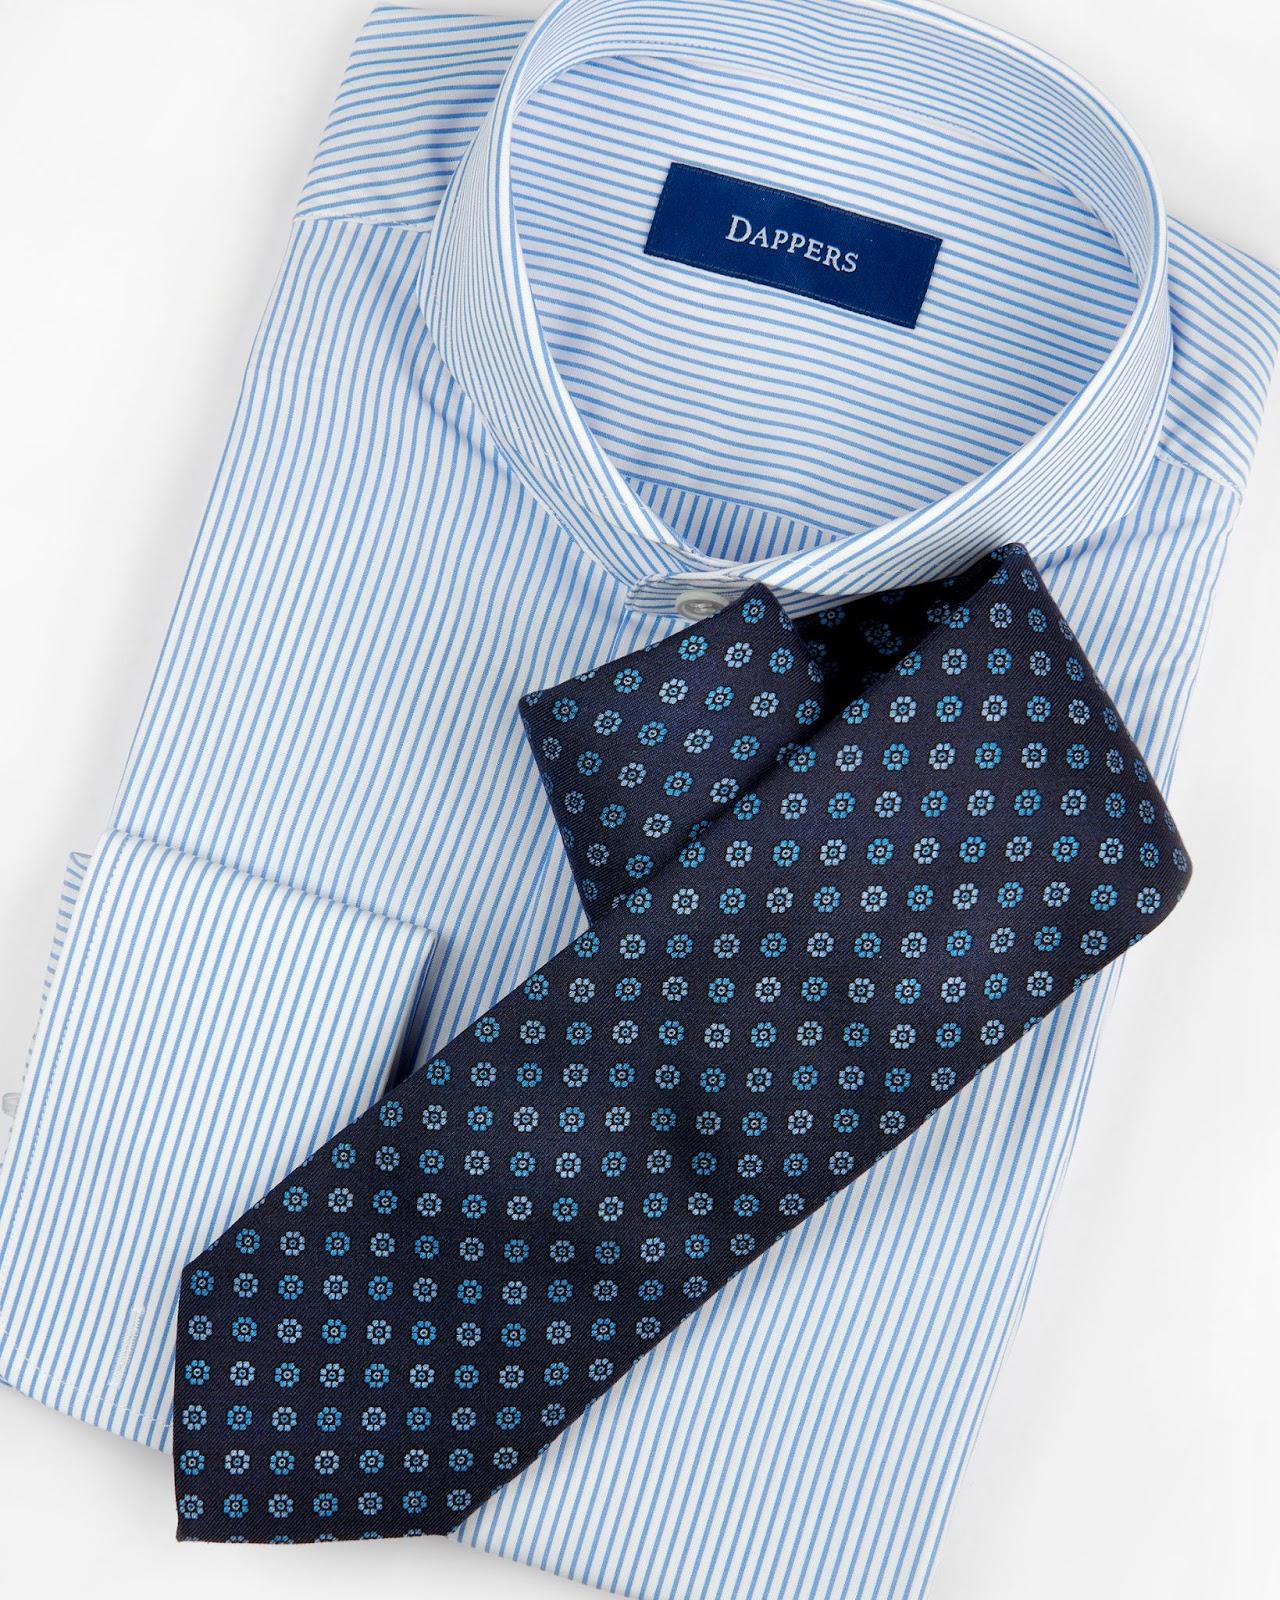 camisa a medida en tu tailoring personal en sevilla